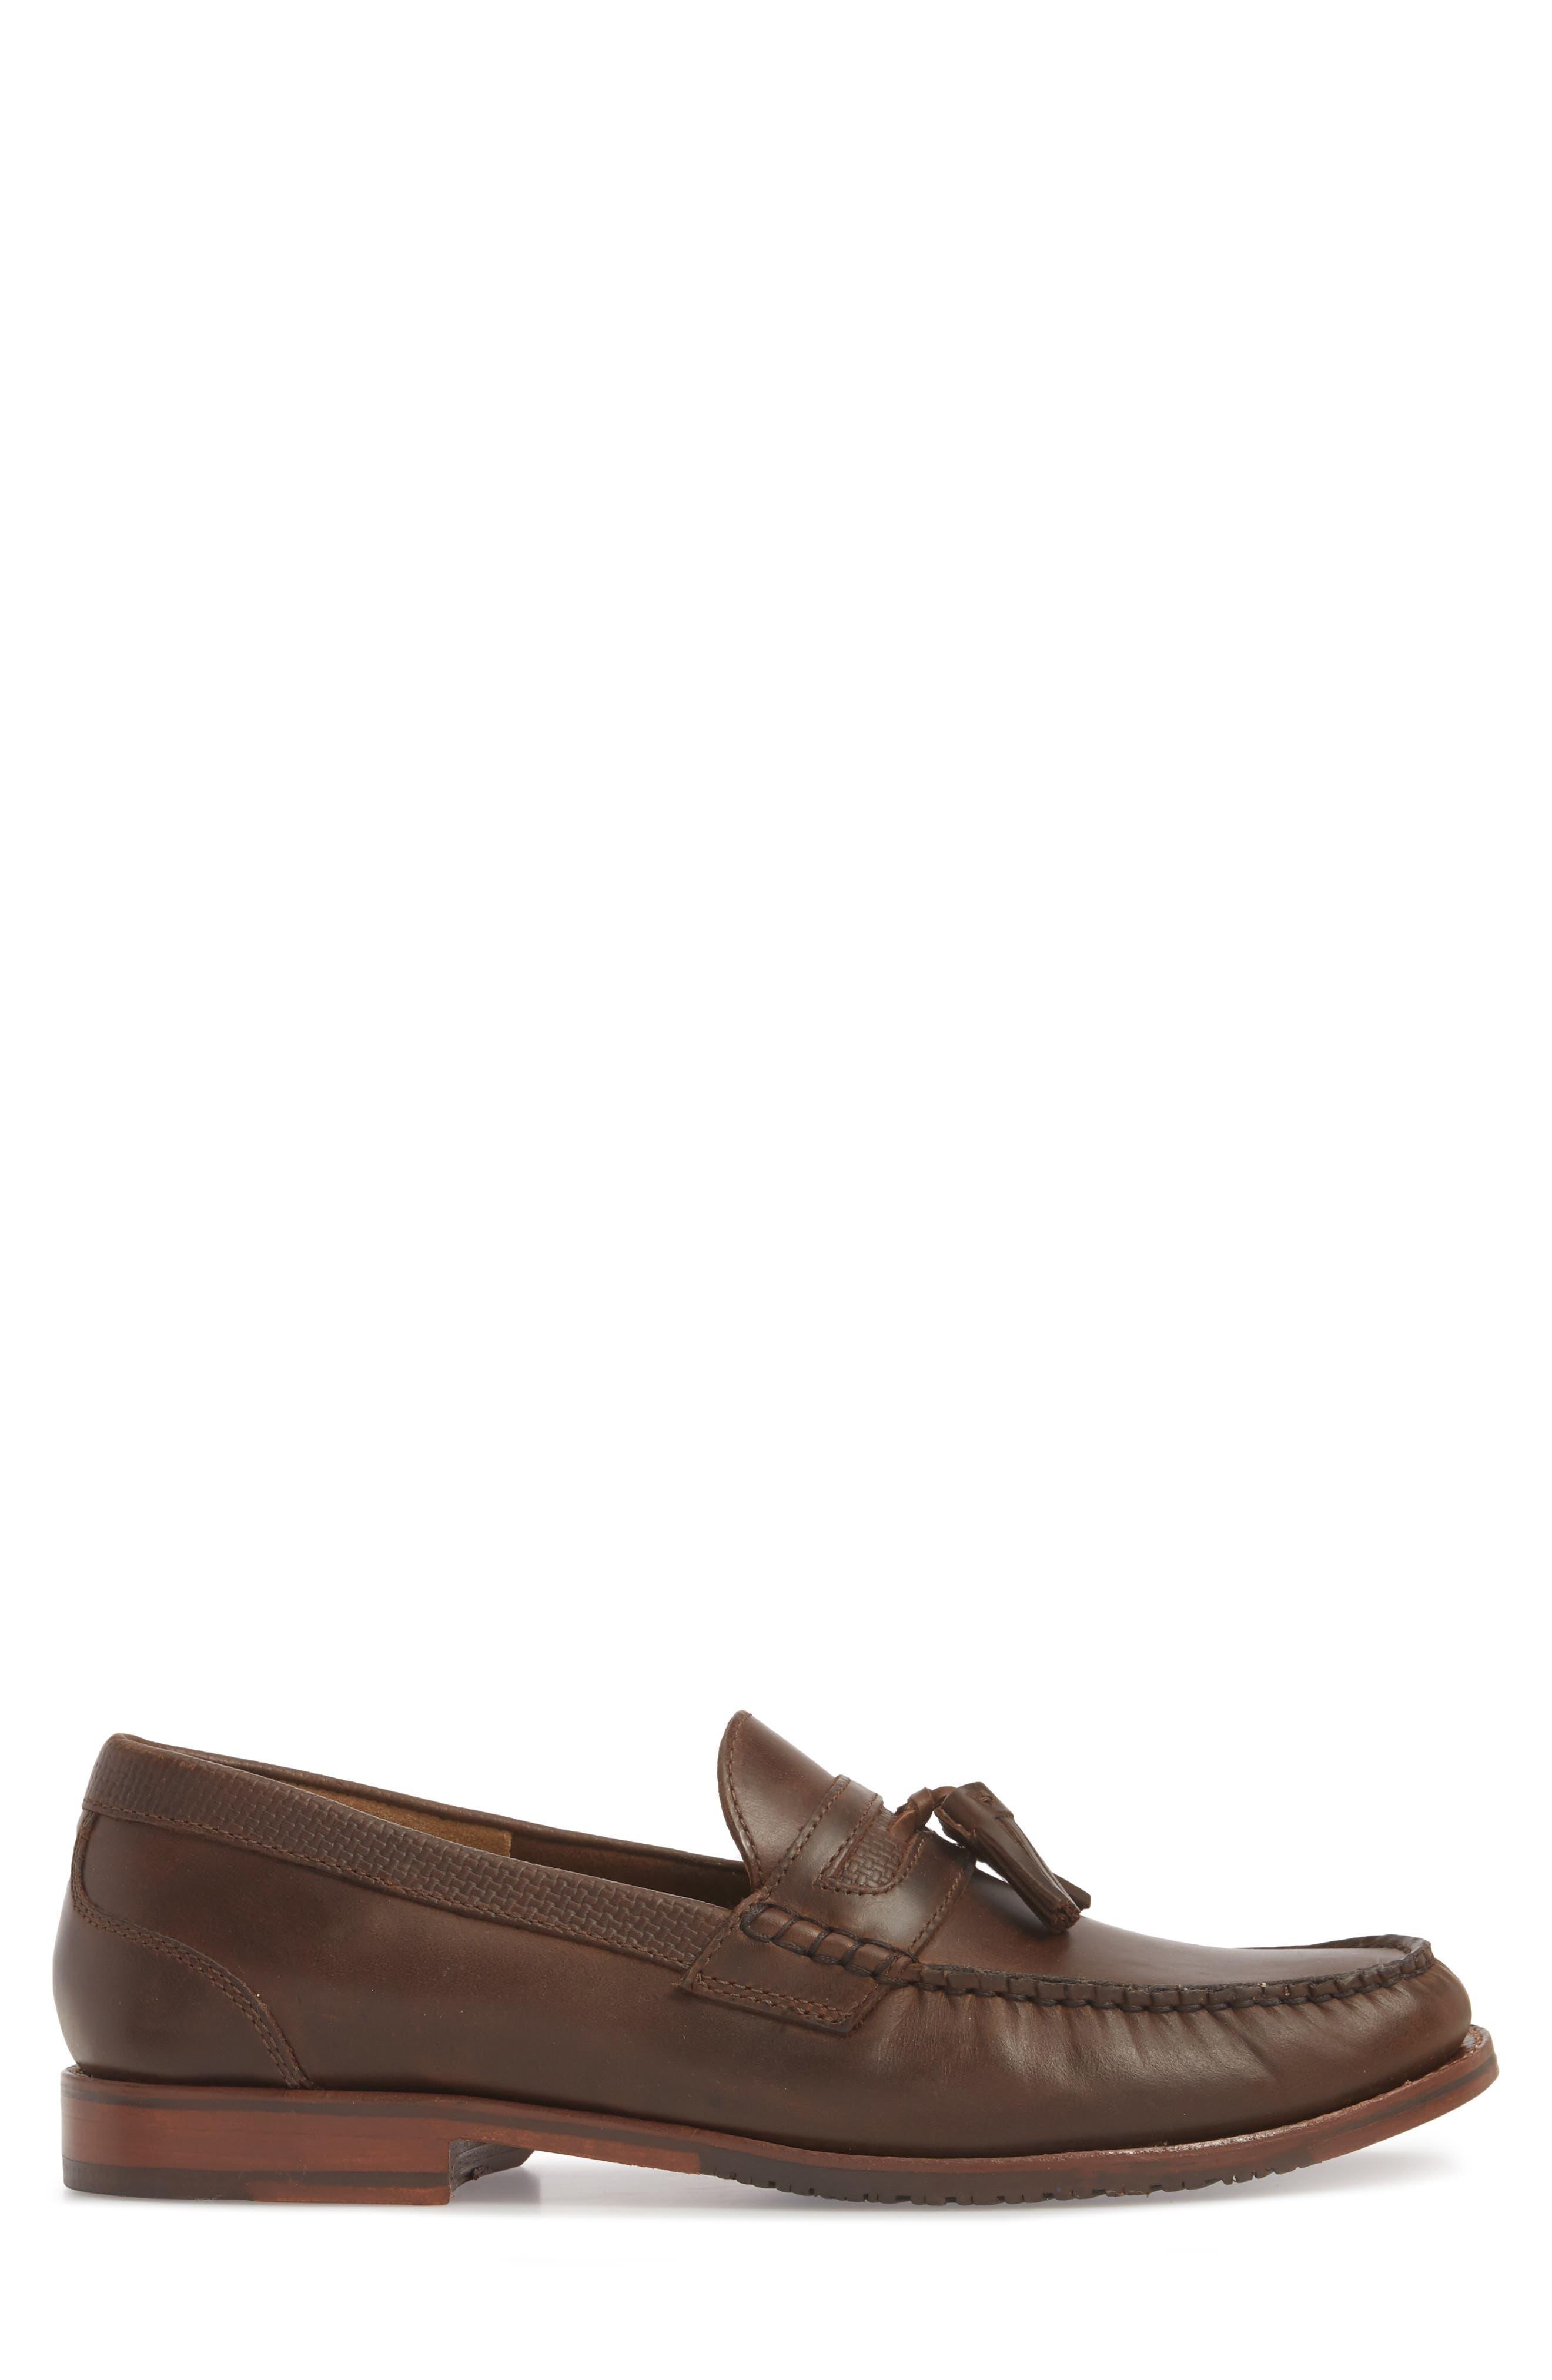 Tasslington Loafer,                             Alternate thumbnail 6, color,                             Dark Brown Leather